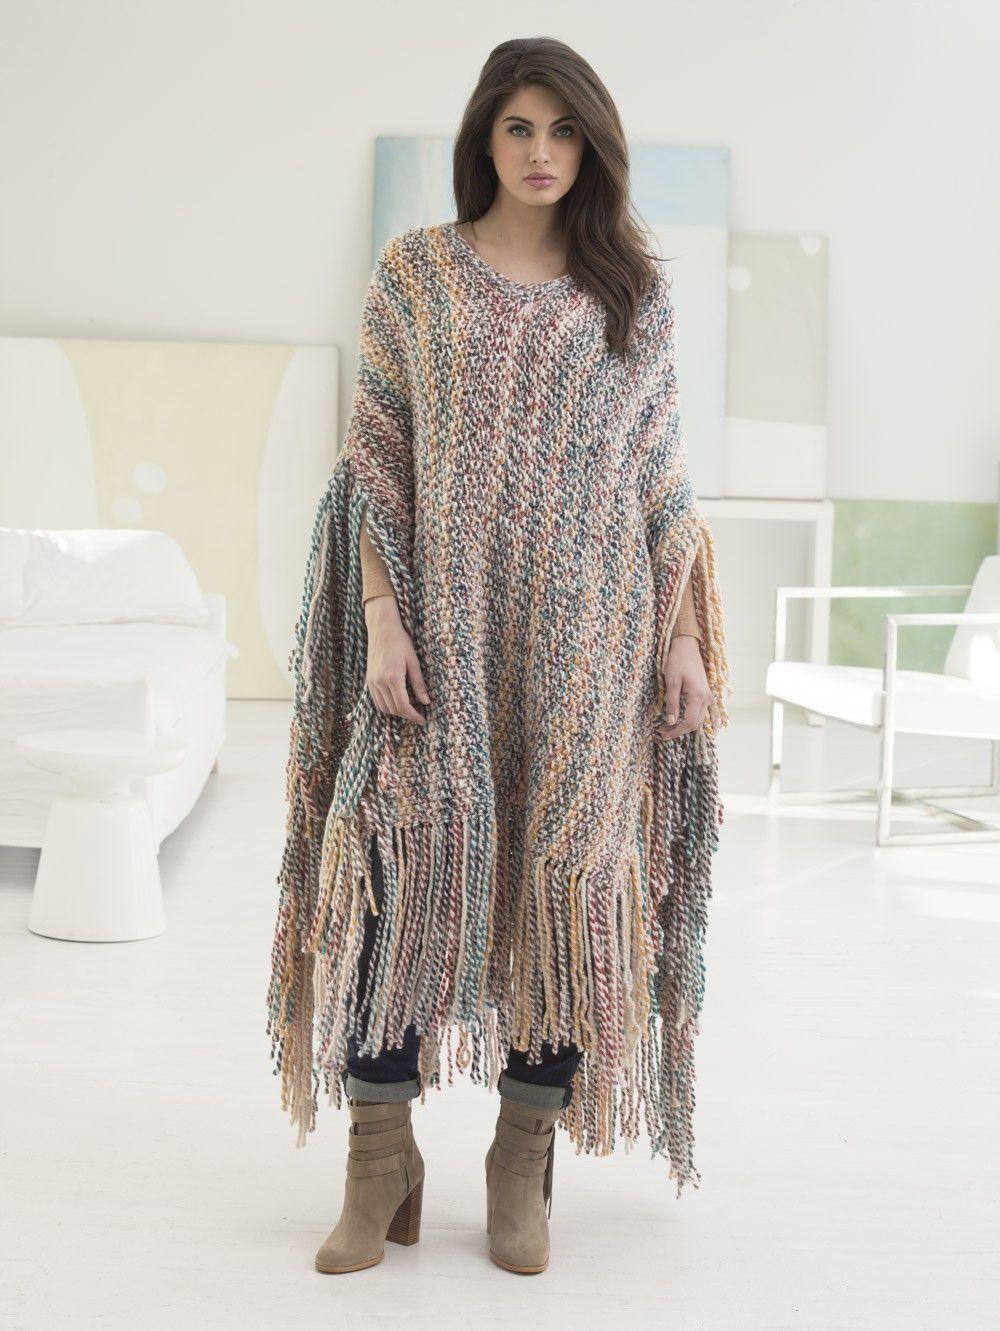 Big Sky Poncho (Knit) - Patterns - Lion Brand Yarn | I Love Knitting ...